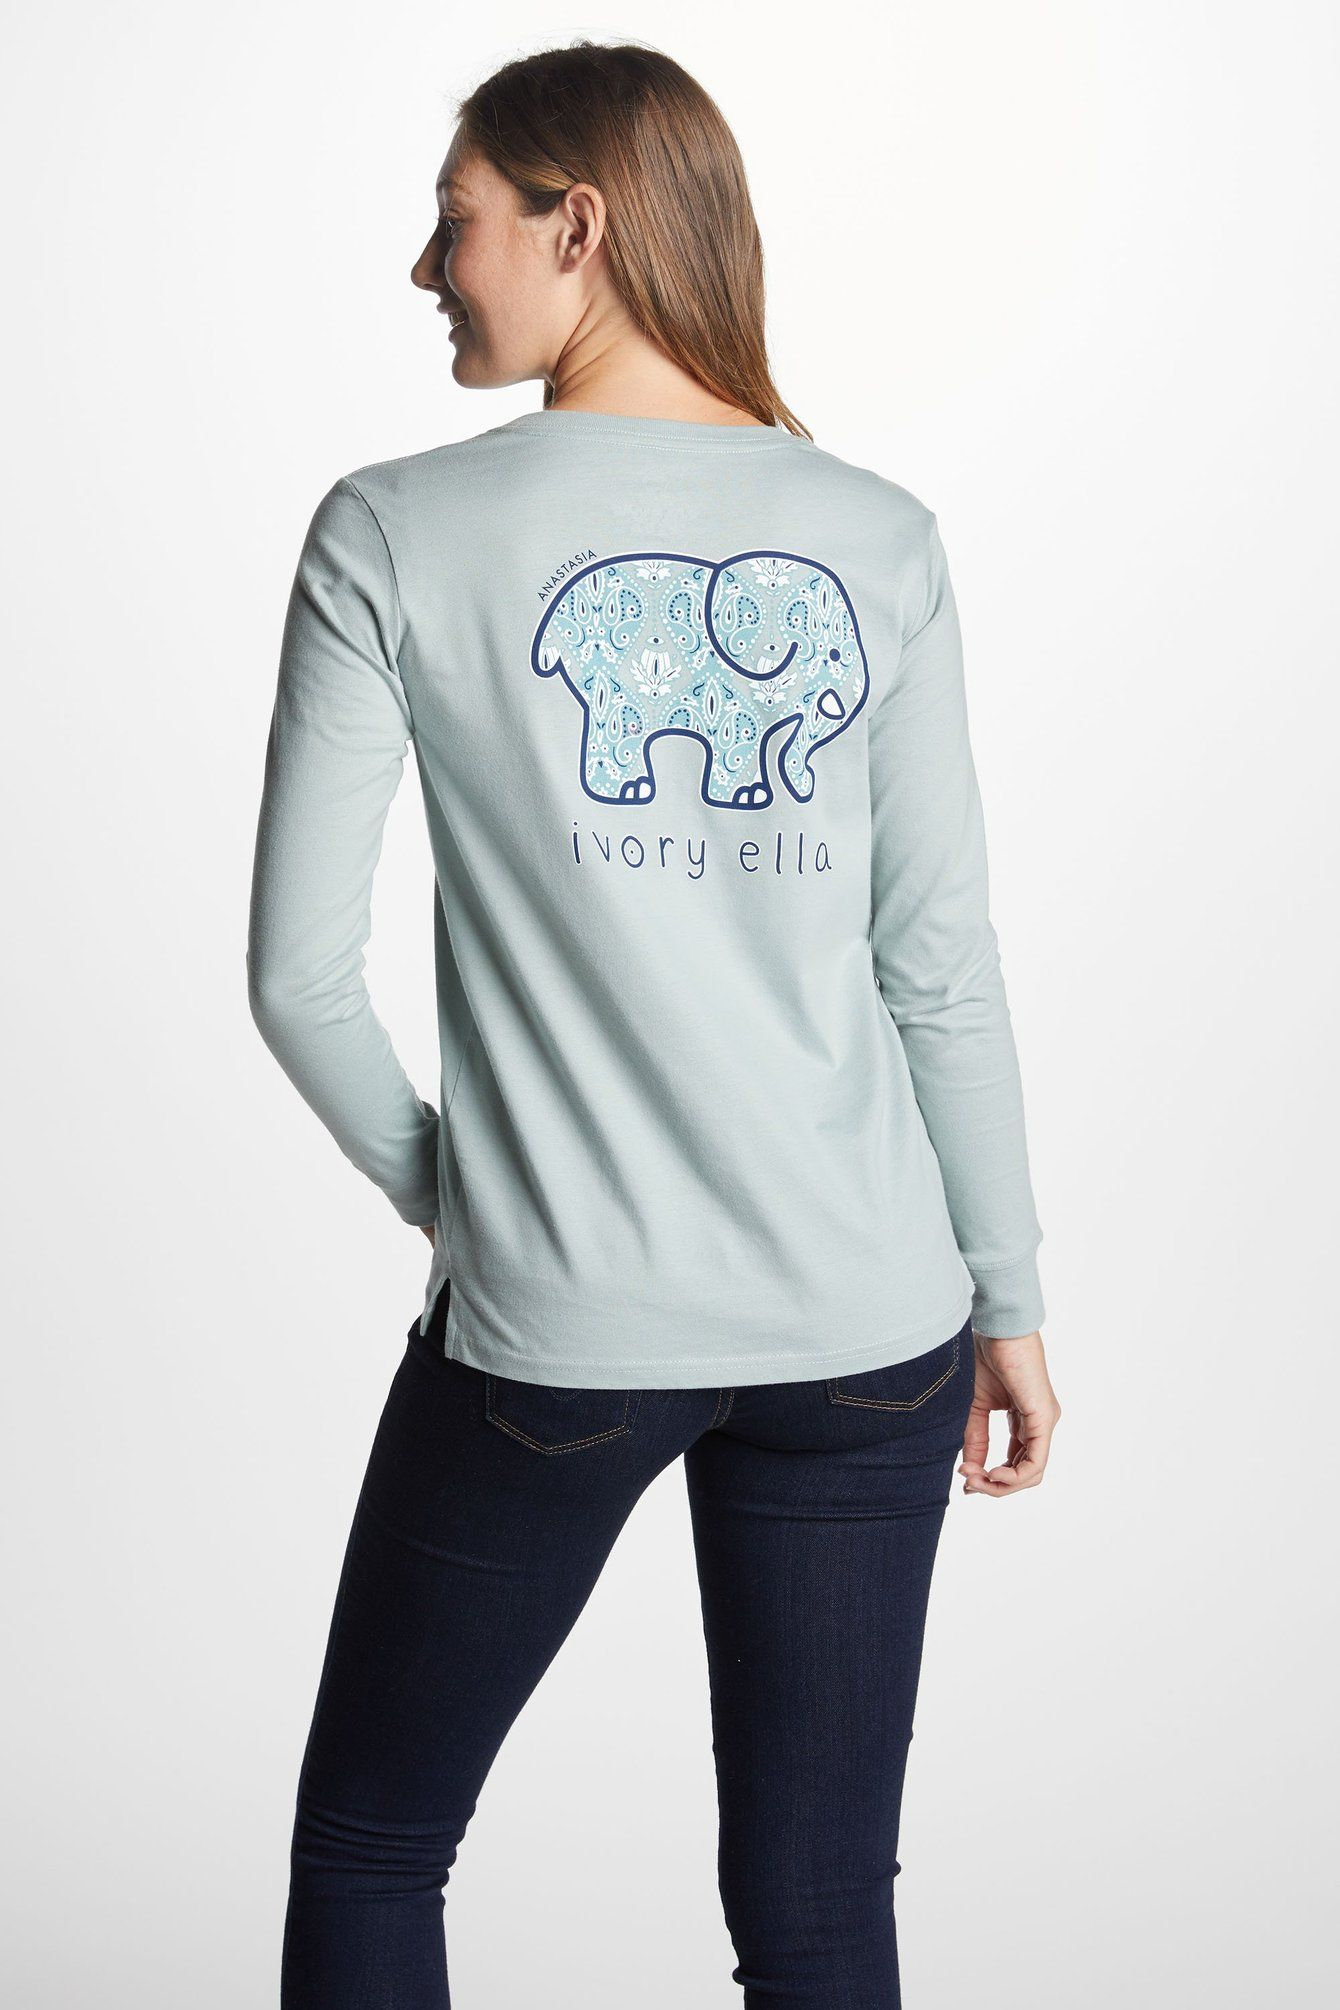 a07b9f6af8ba67 Ivory Ella - Good Clothes For A Good Cause. March 2019. Ivory Ella Vivid  Green Virgo T-Shirt